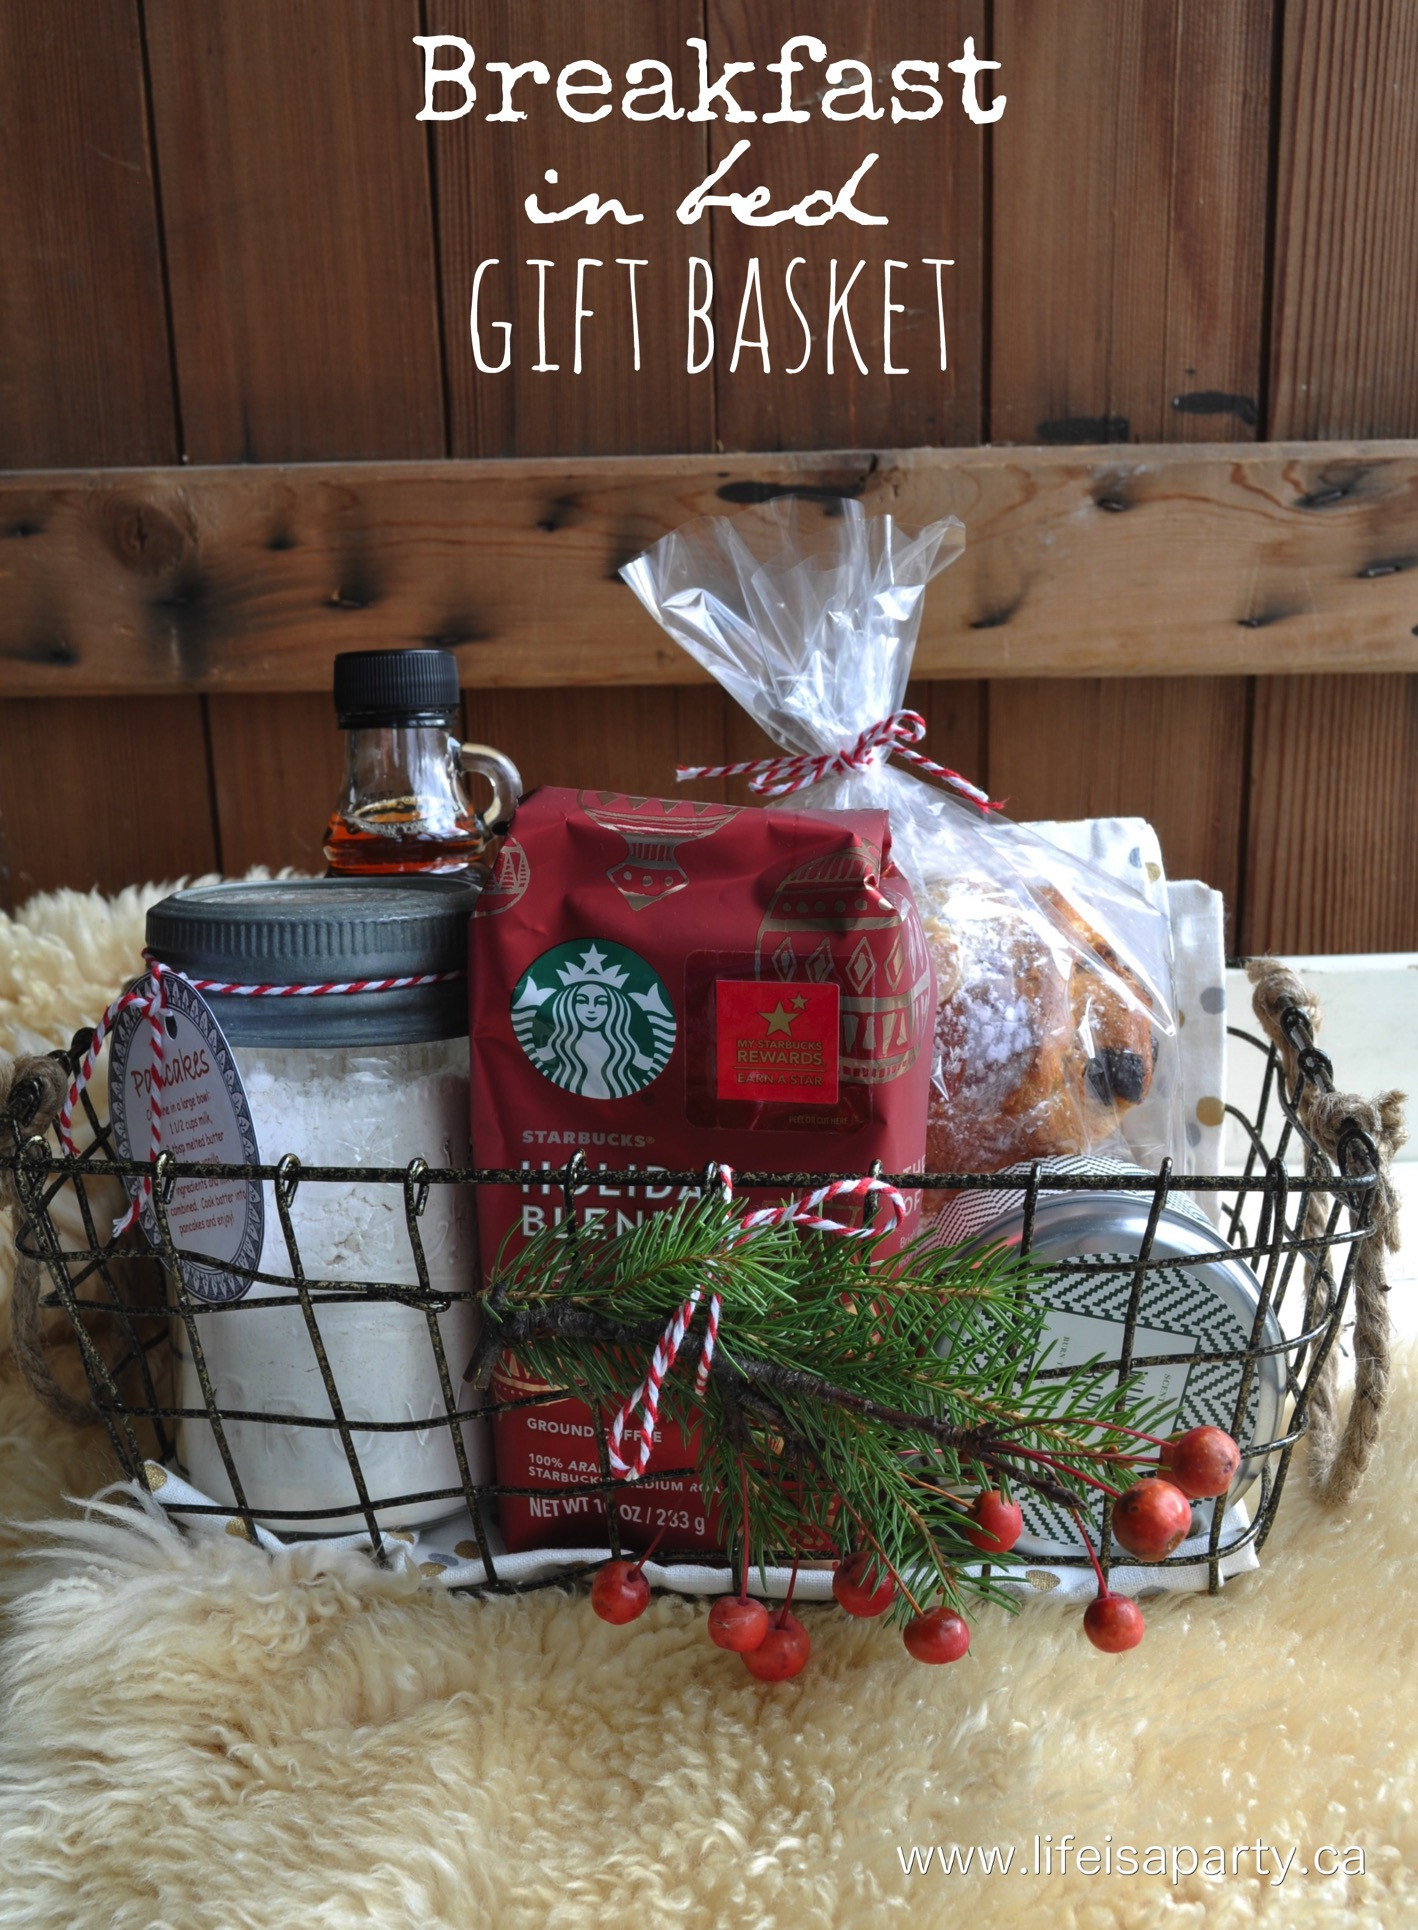 Best ideas about Pinterest Gift Basket Ideas . Save or Pin DIY Gift Basket Ideas The Idea Room Now.